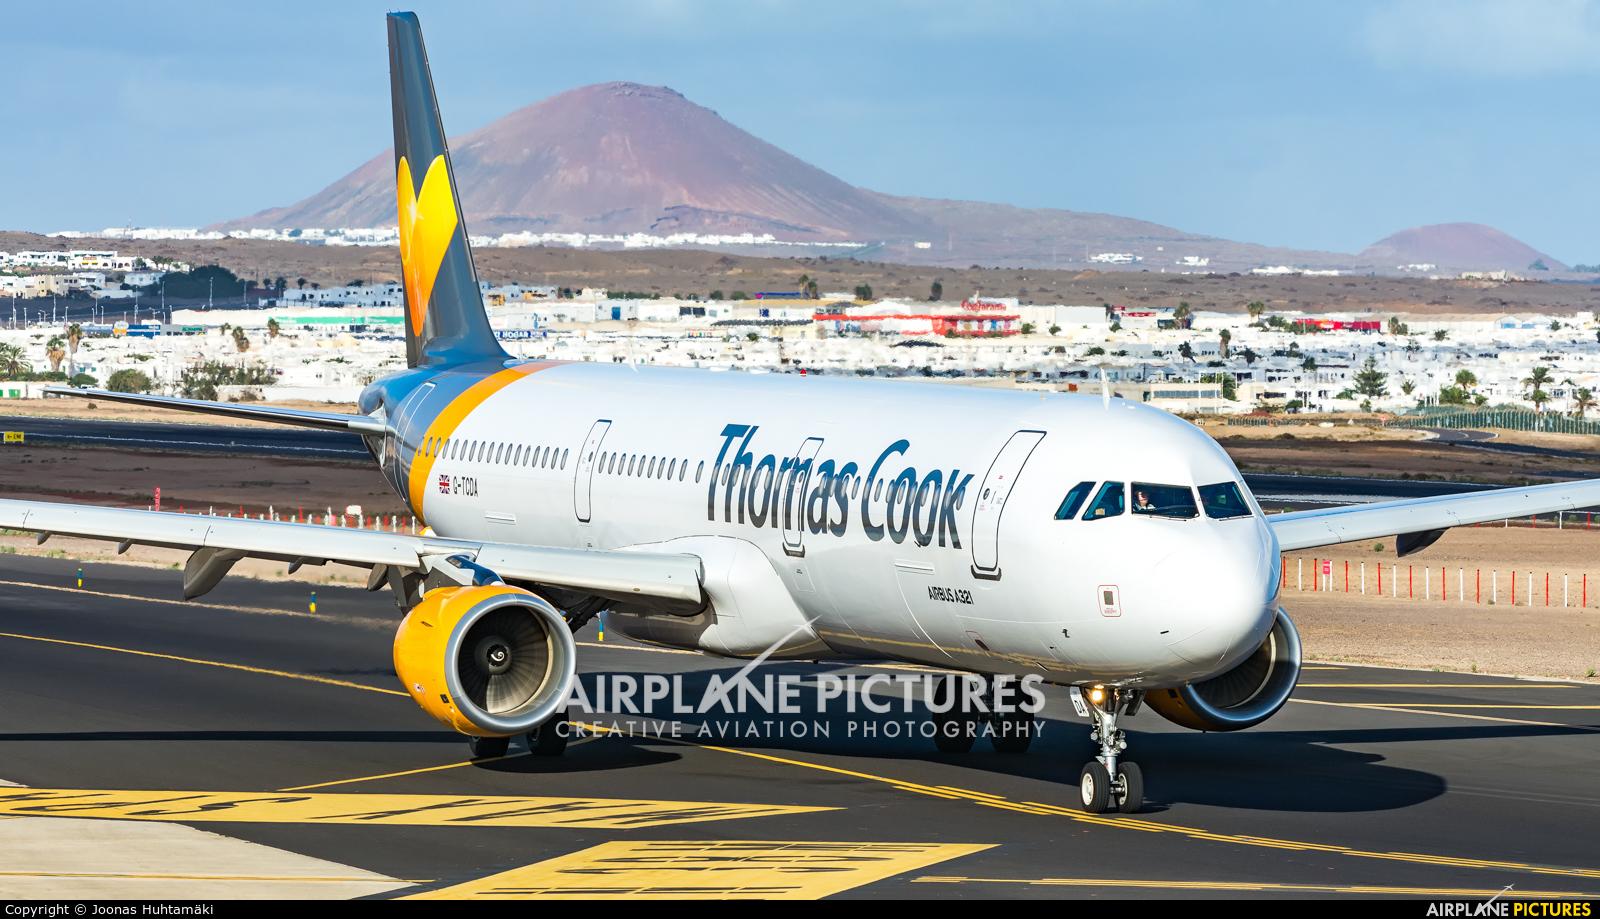 Thomas Cook G-TCDA aircraft at Lanzarote - Arrecife